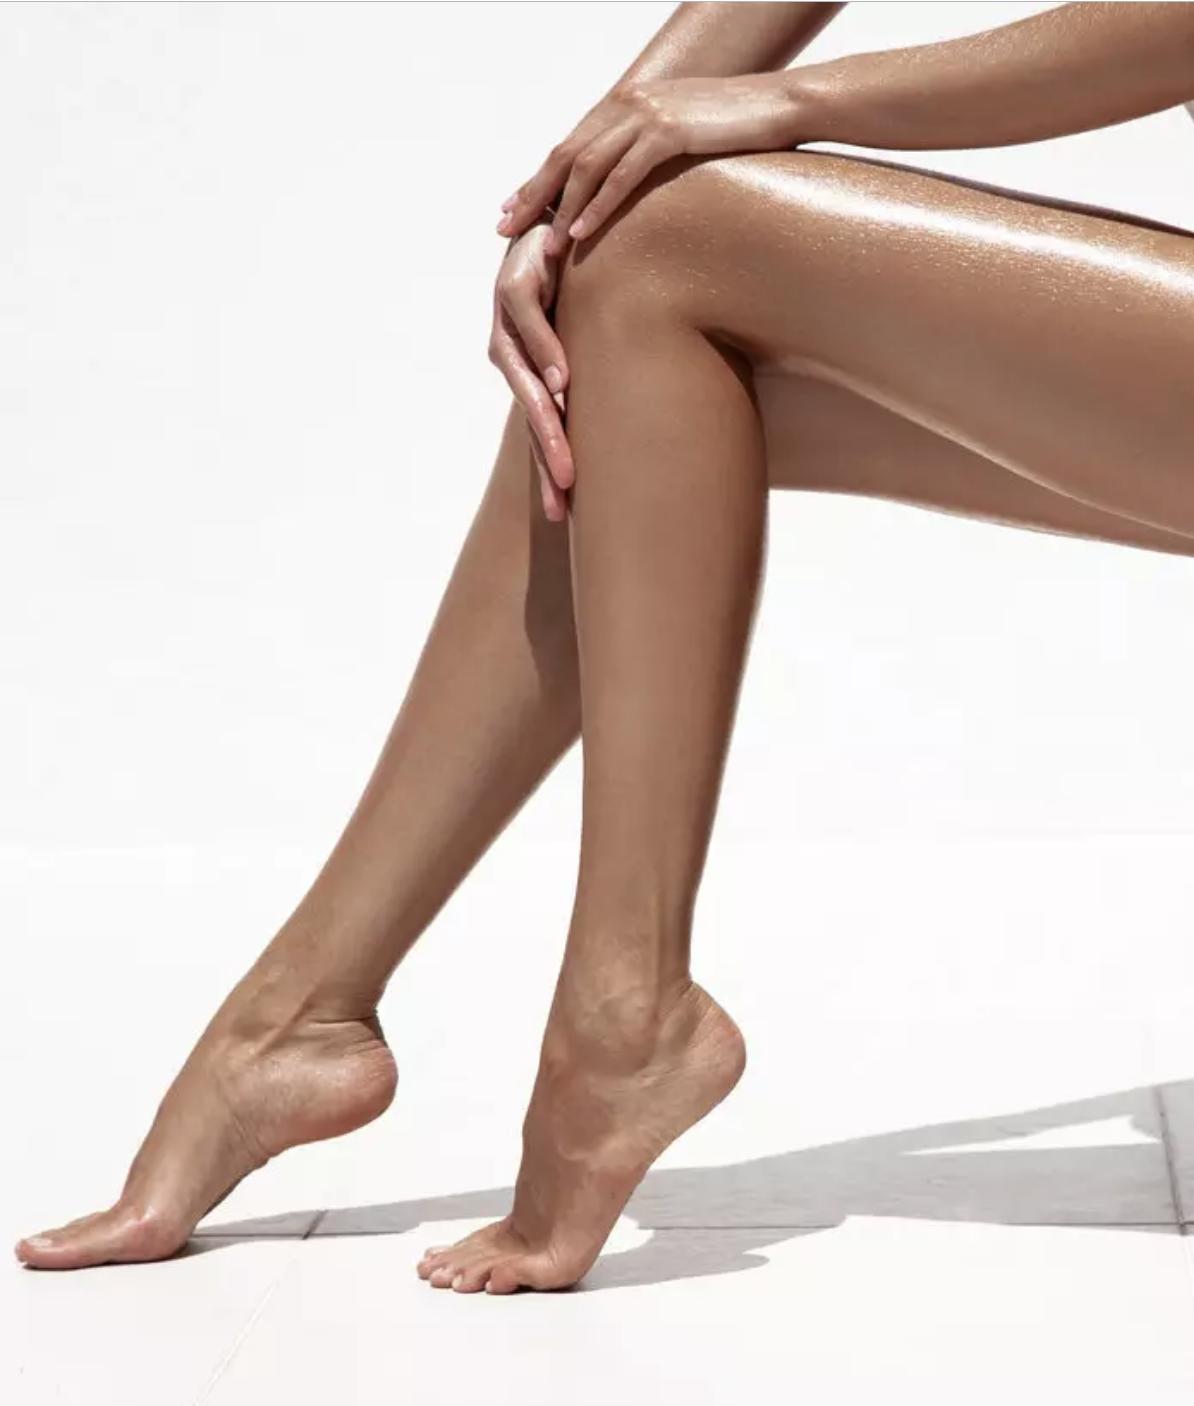 spray tanned legs